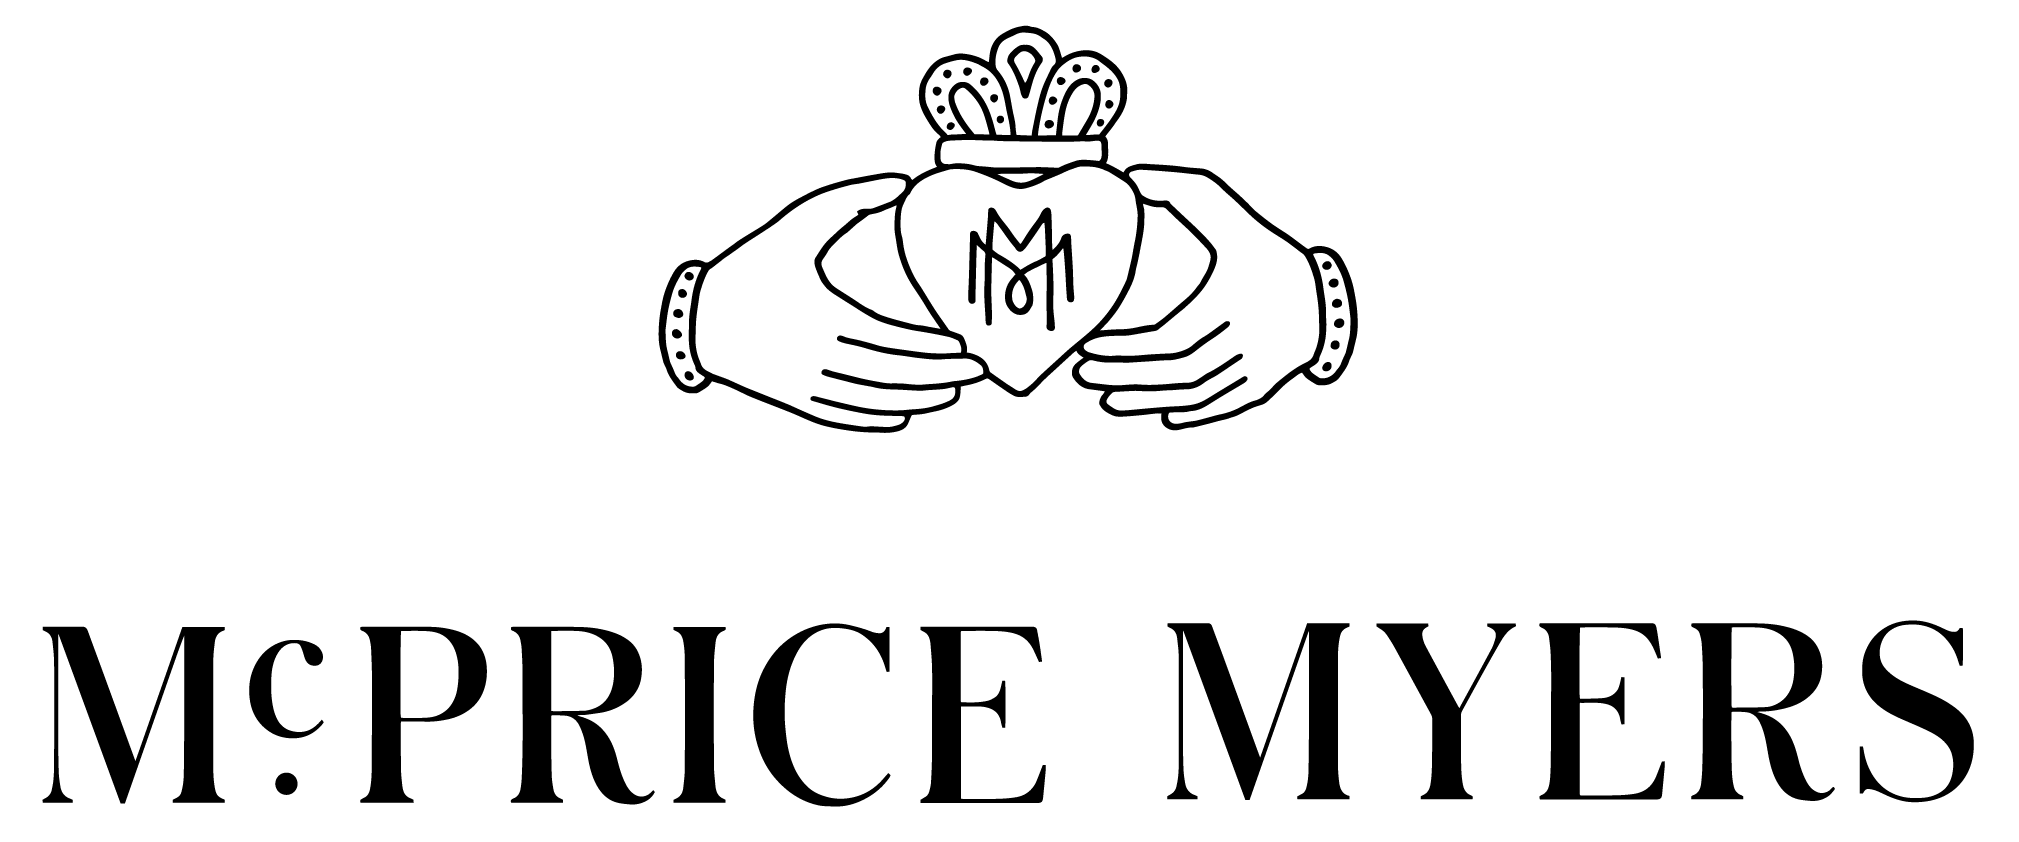 Mc Price Myers Logos Full Black